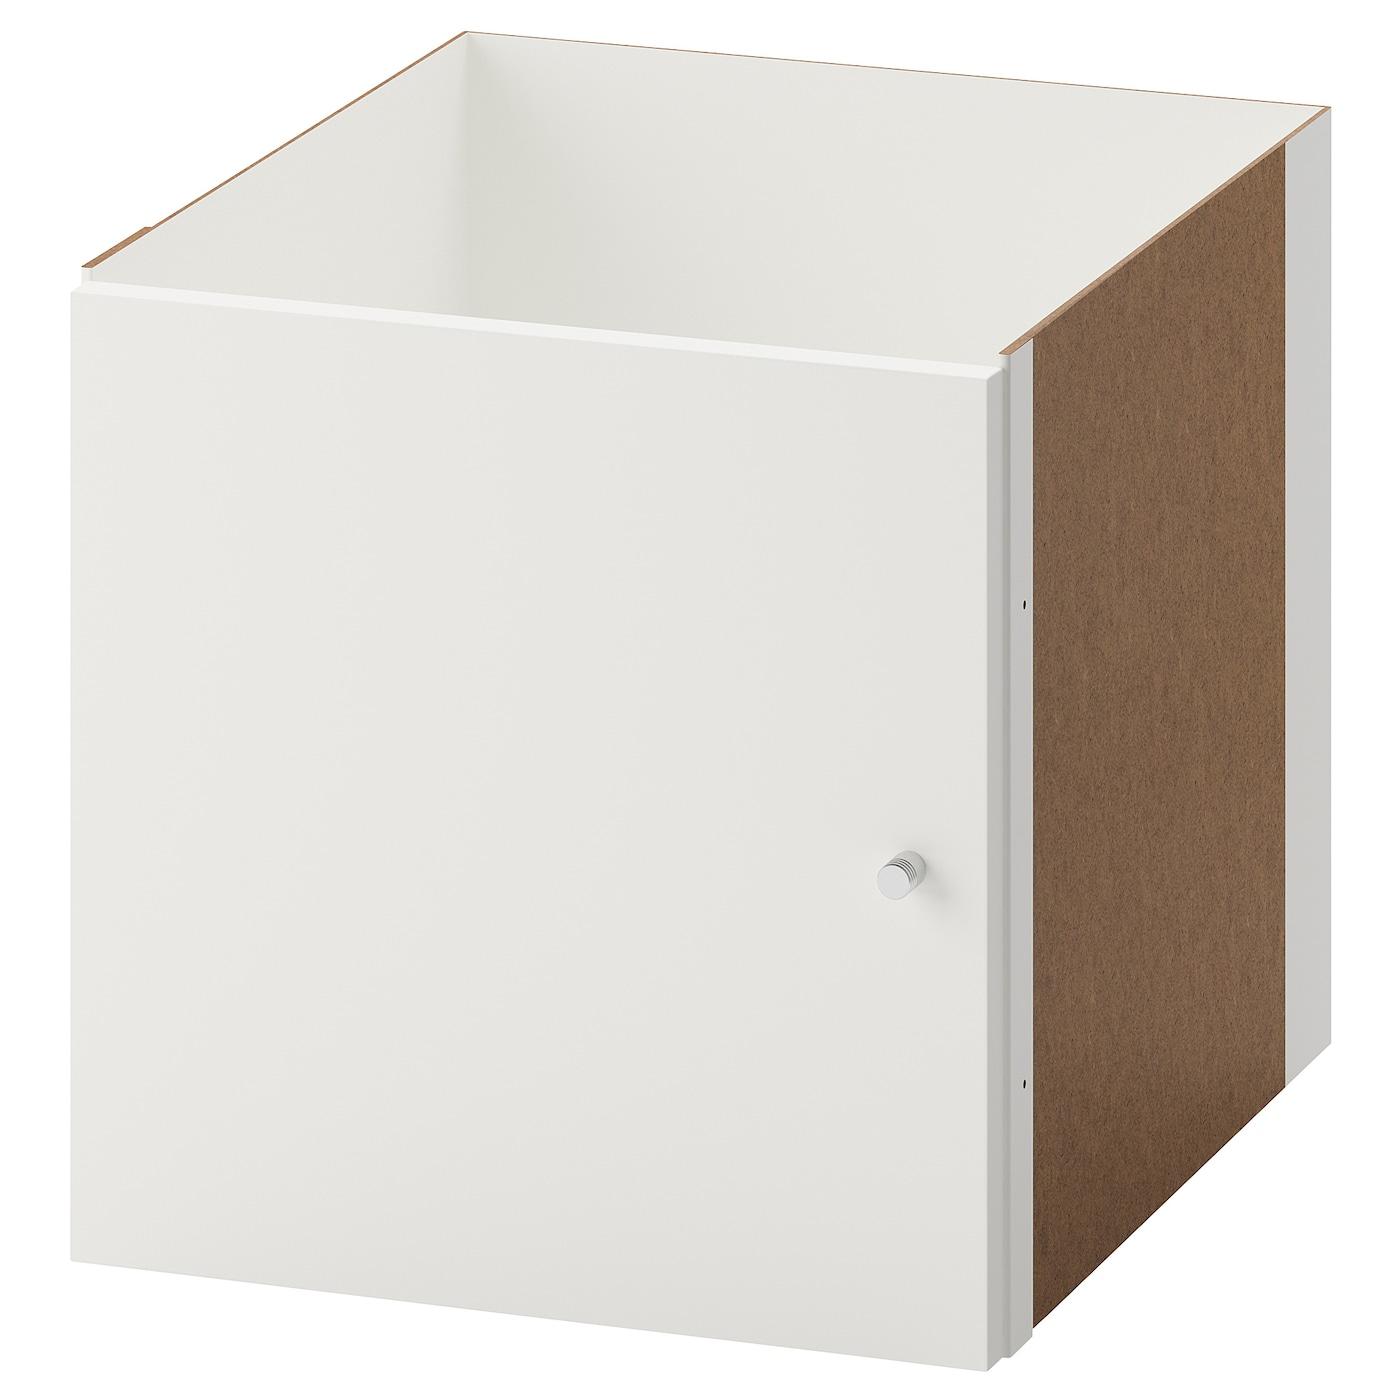 Porte Laque Blanc Ikea kallax bloc porte - blanc 33x33 cm